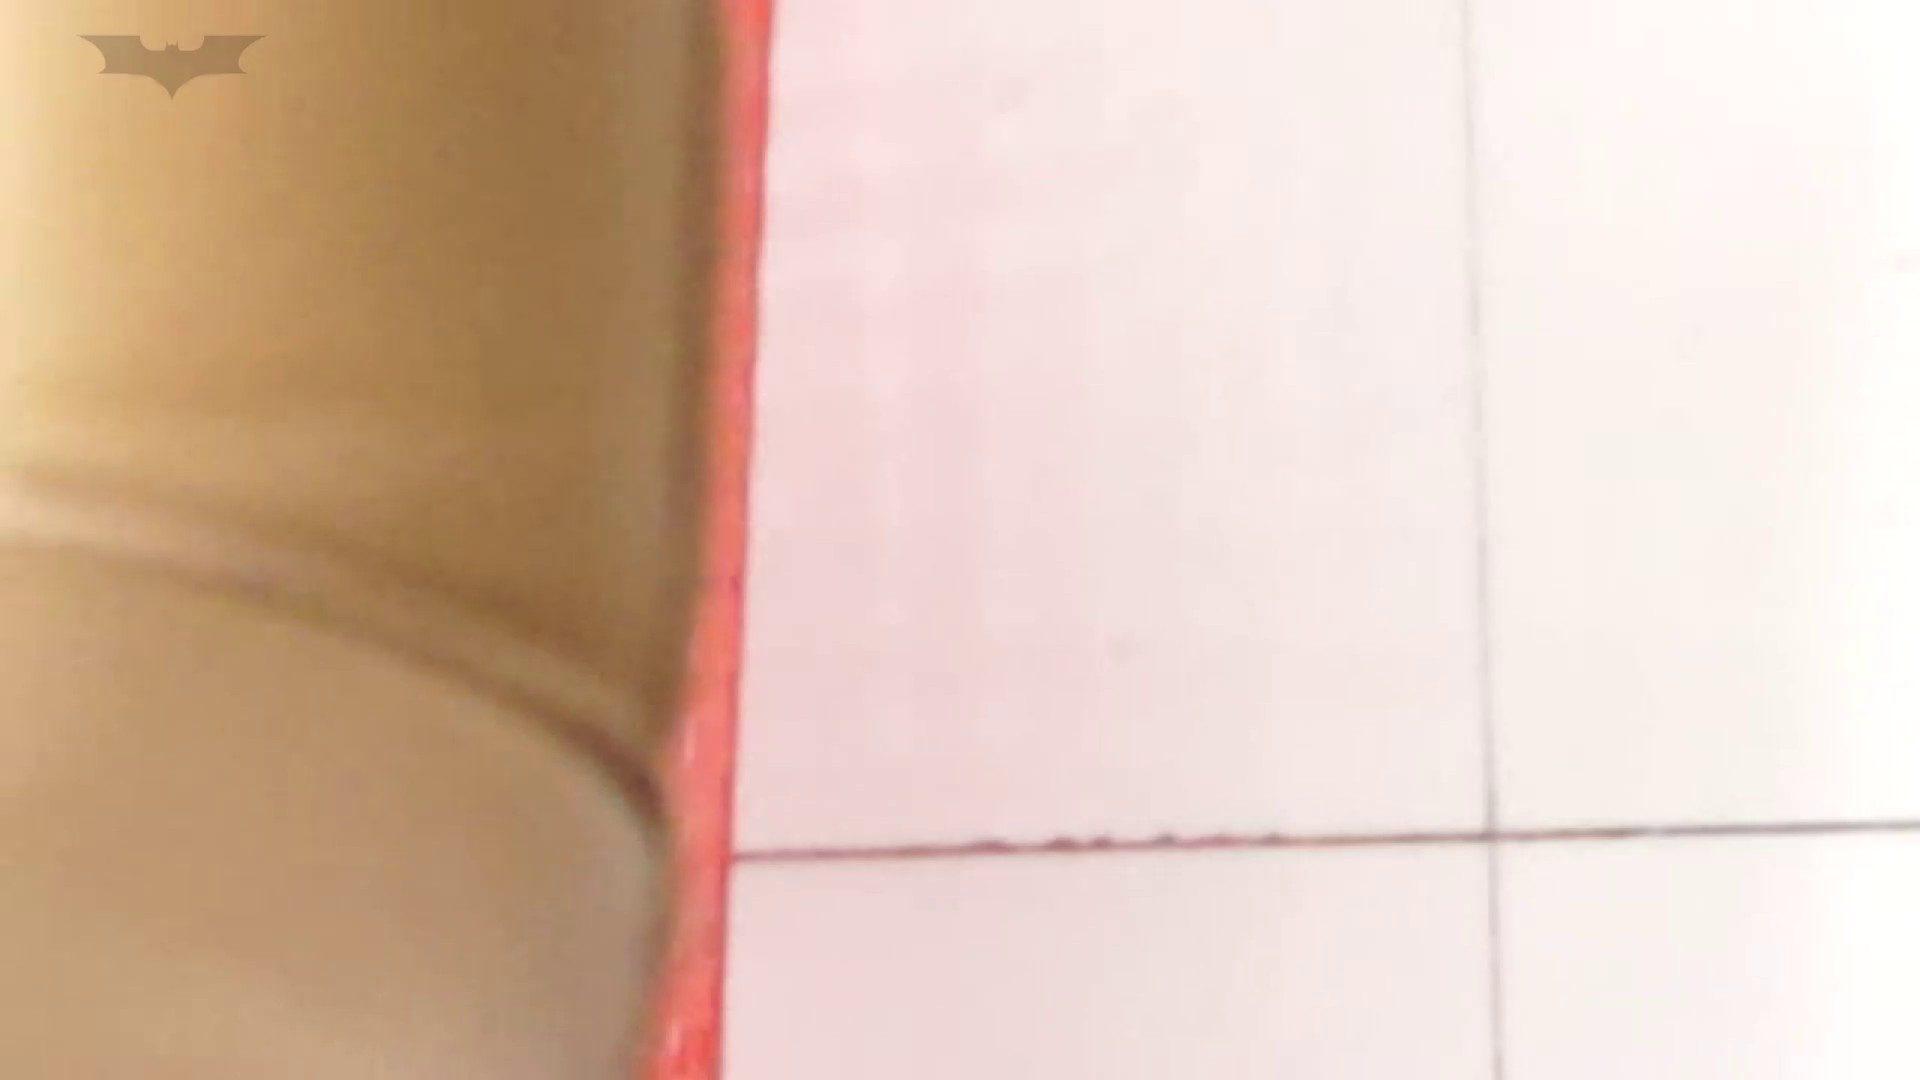 JD盗撮 美女の洗面所の秘密 Vol.19 盗撮 エロ無料画像 70pic 63